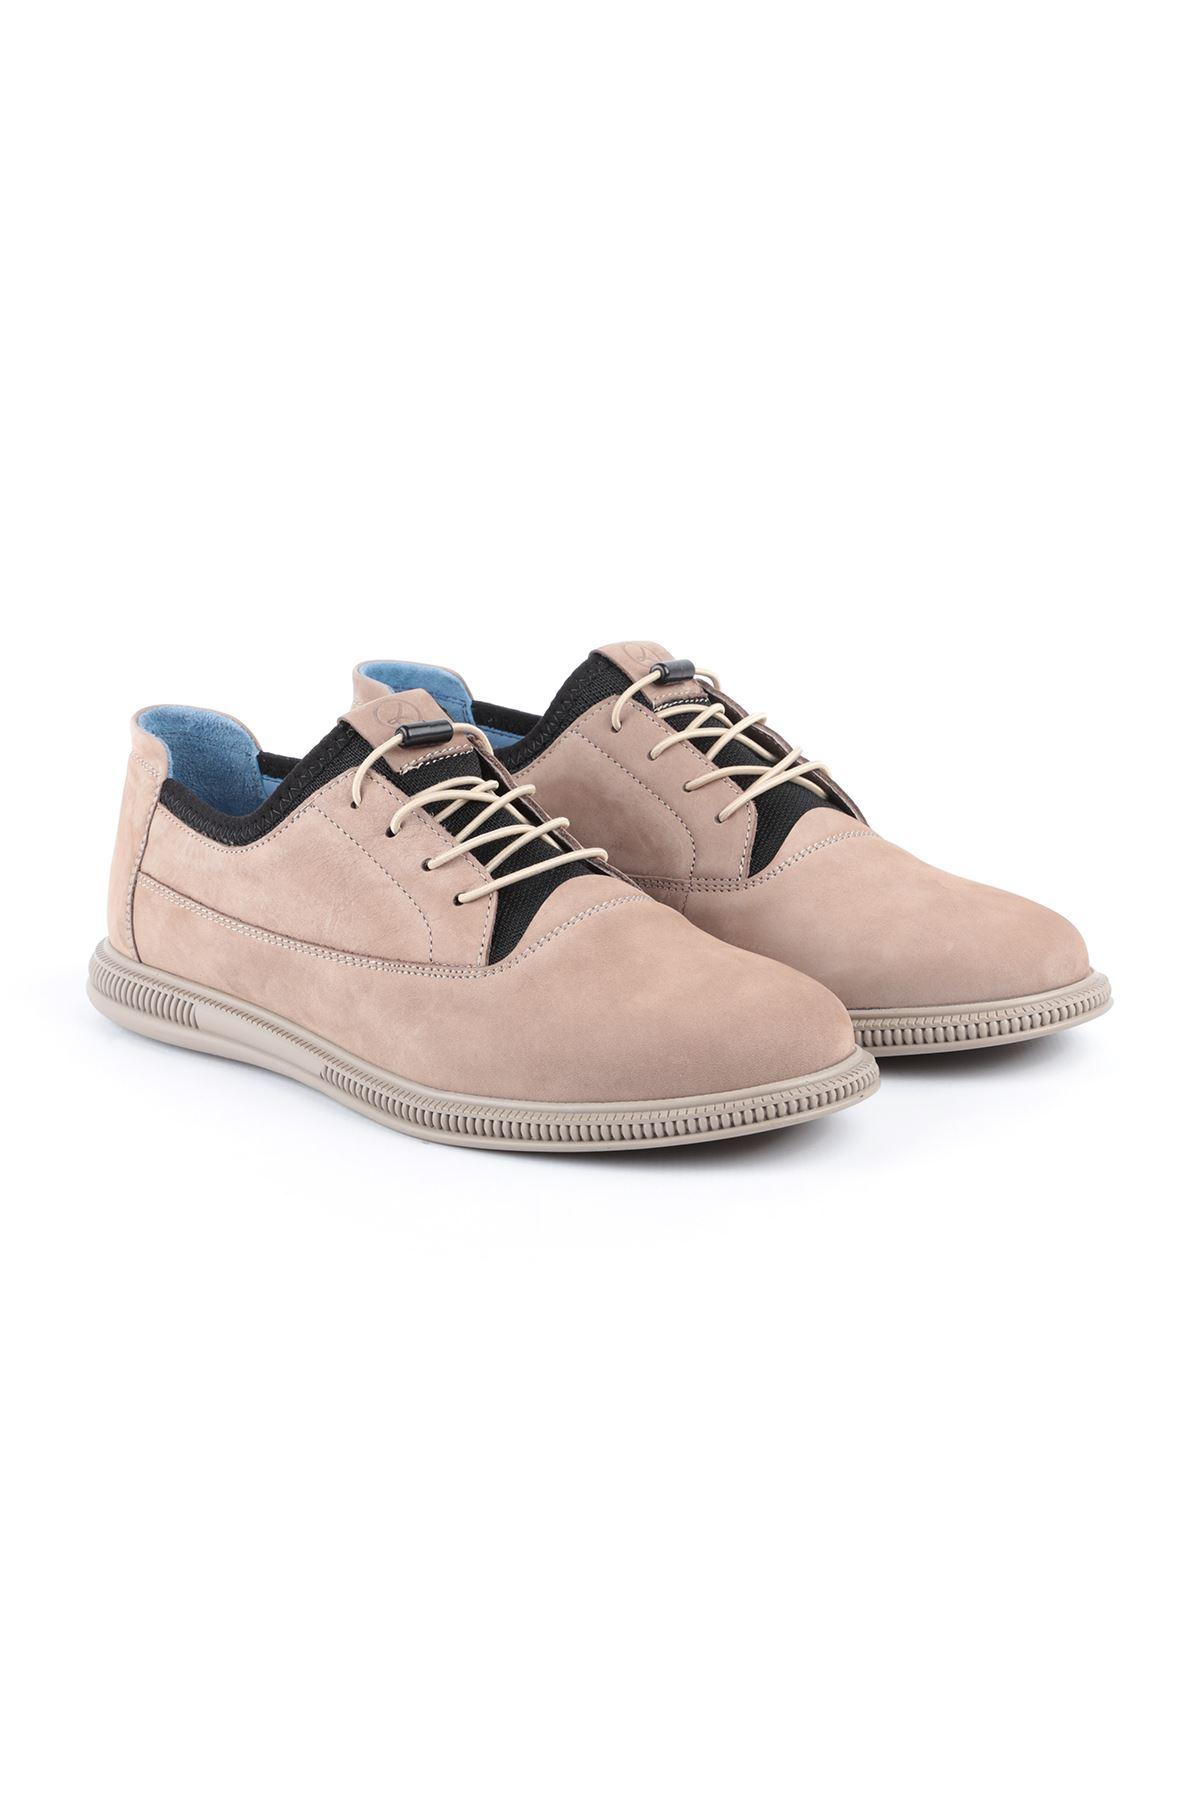 Libero L3726 Vizon Casual Erkek Ayakkabı